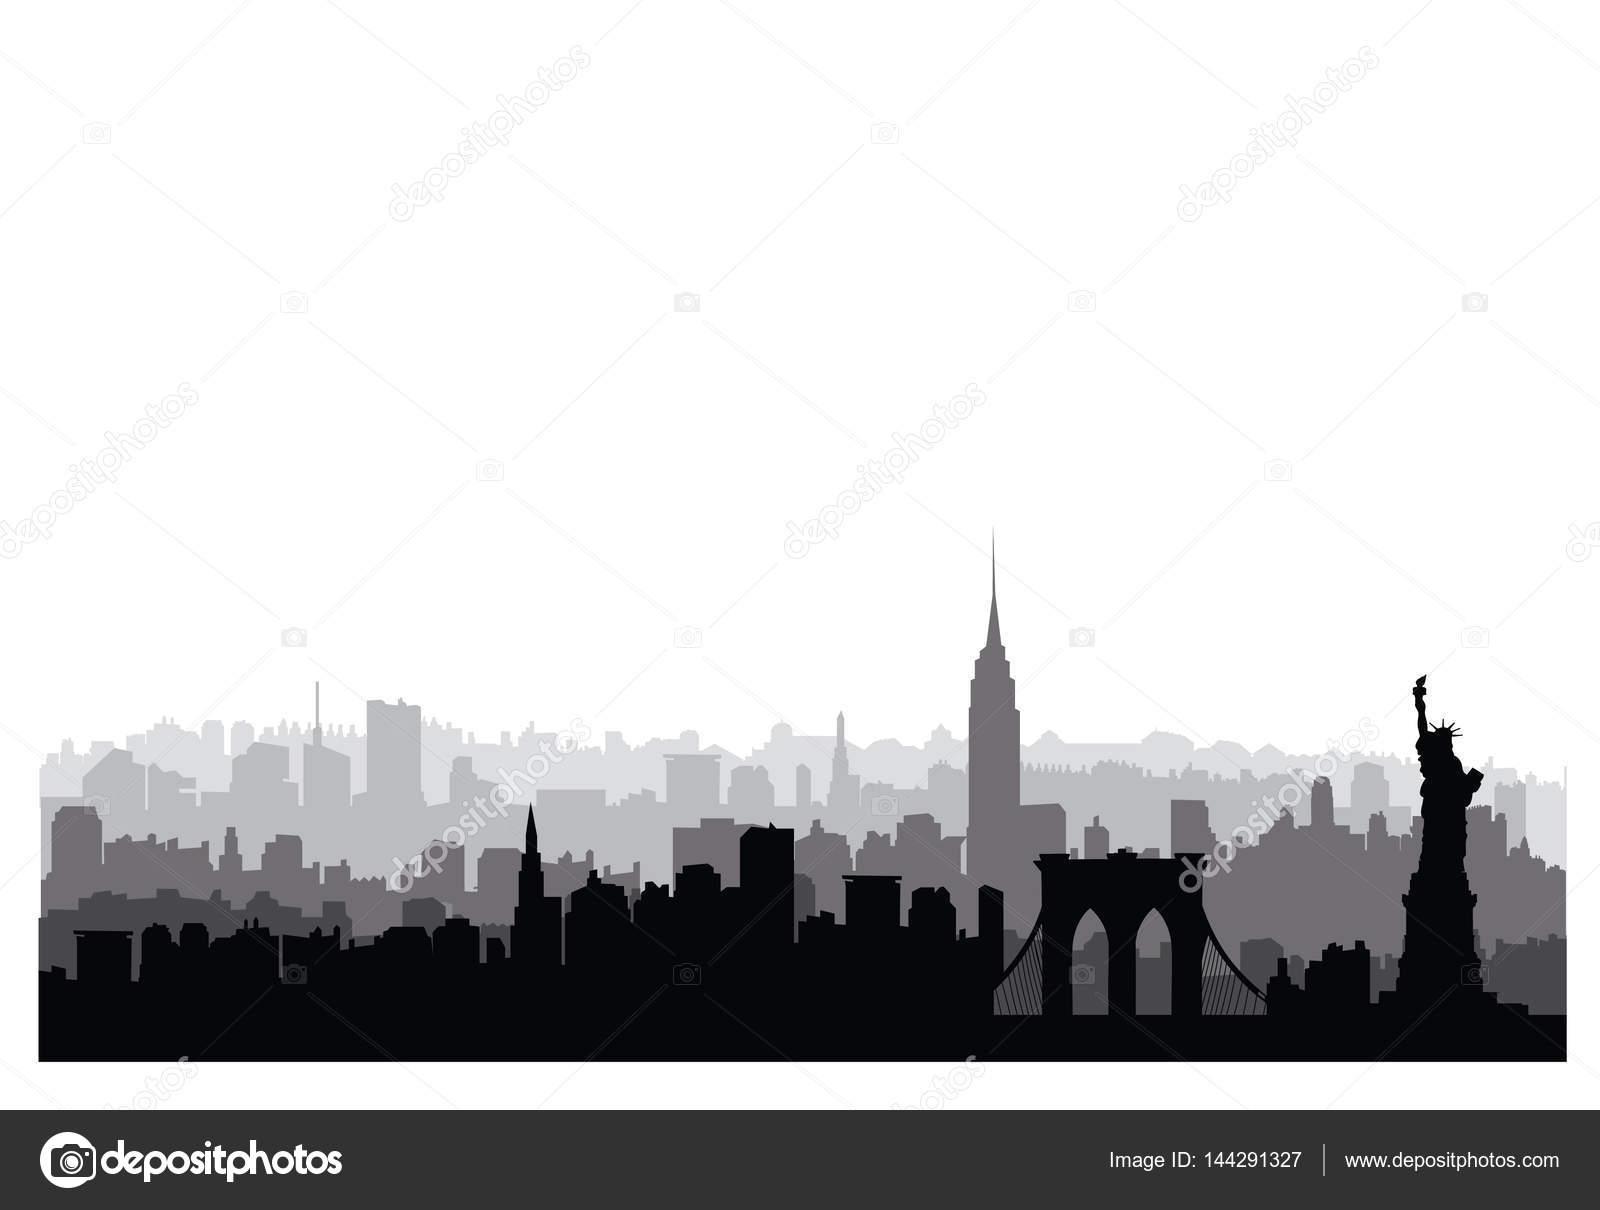 silueta de edificios de nueva york u vector de stock